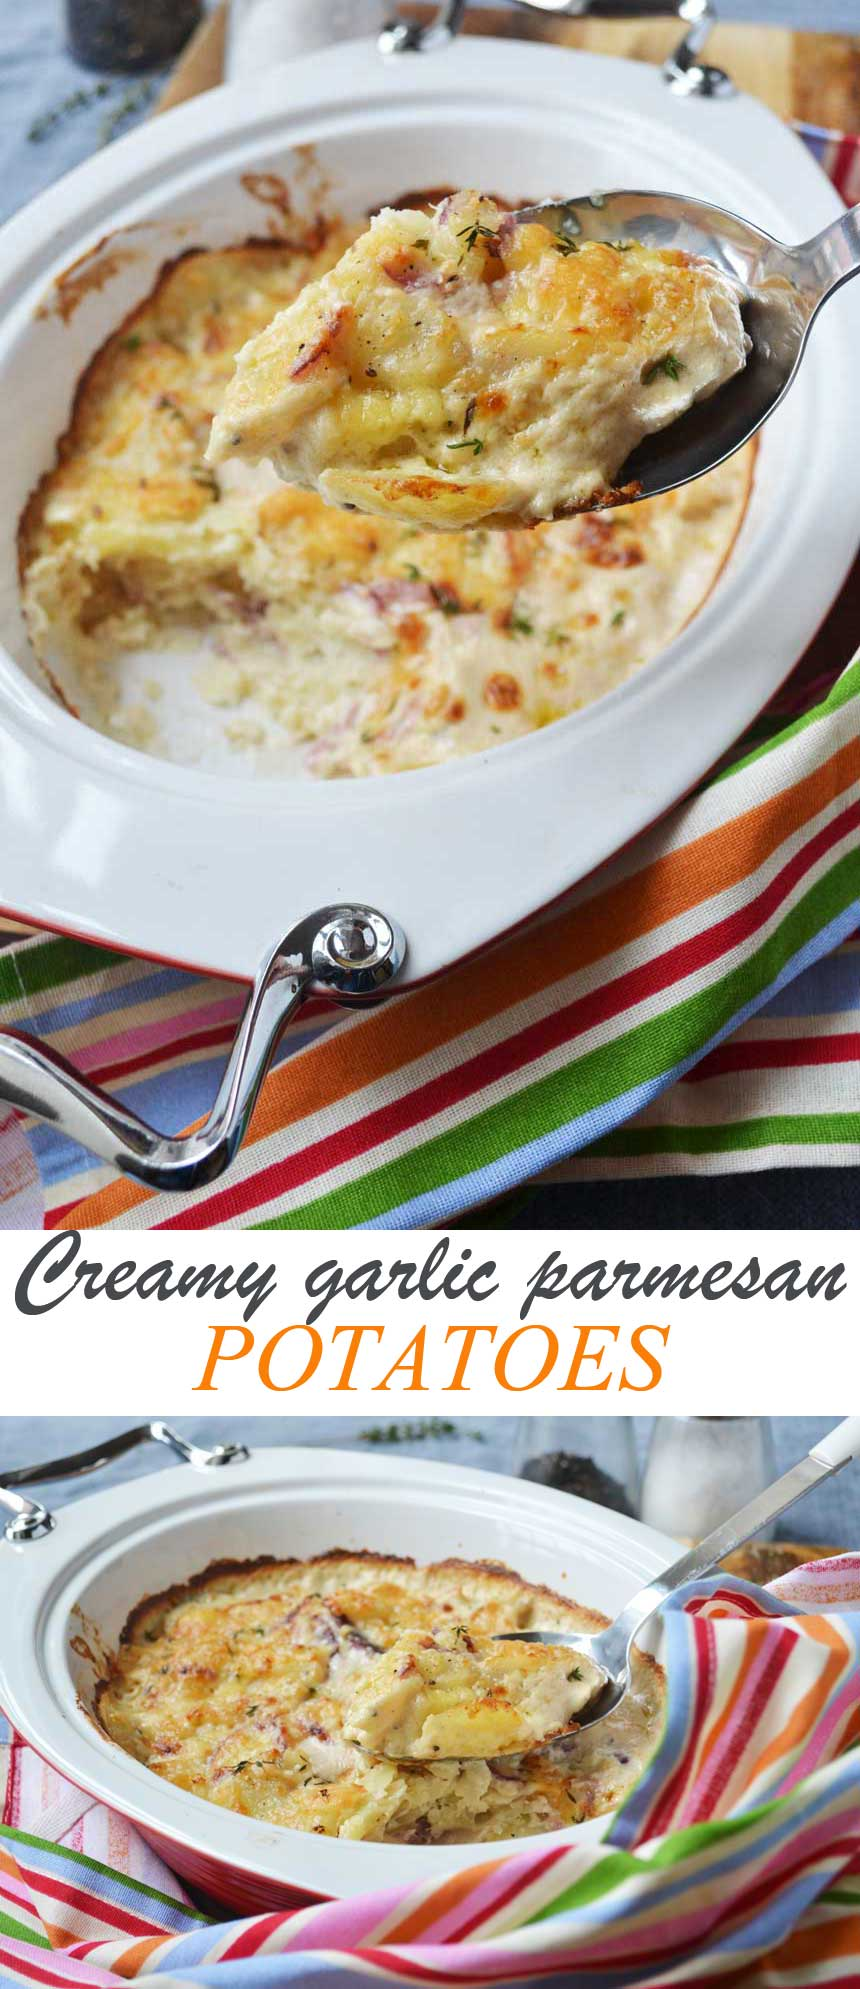 Creamy garlic parmesan potatoes (dauphinoise potatoes)